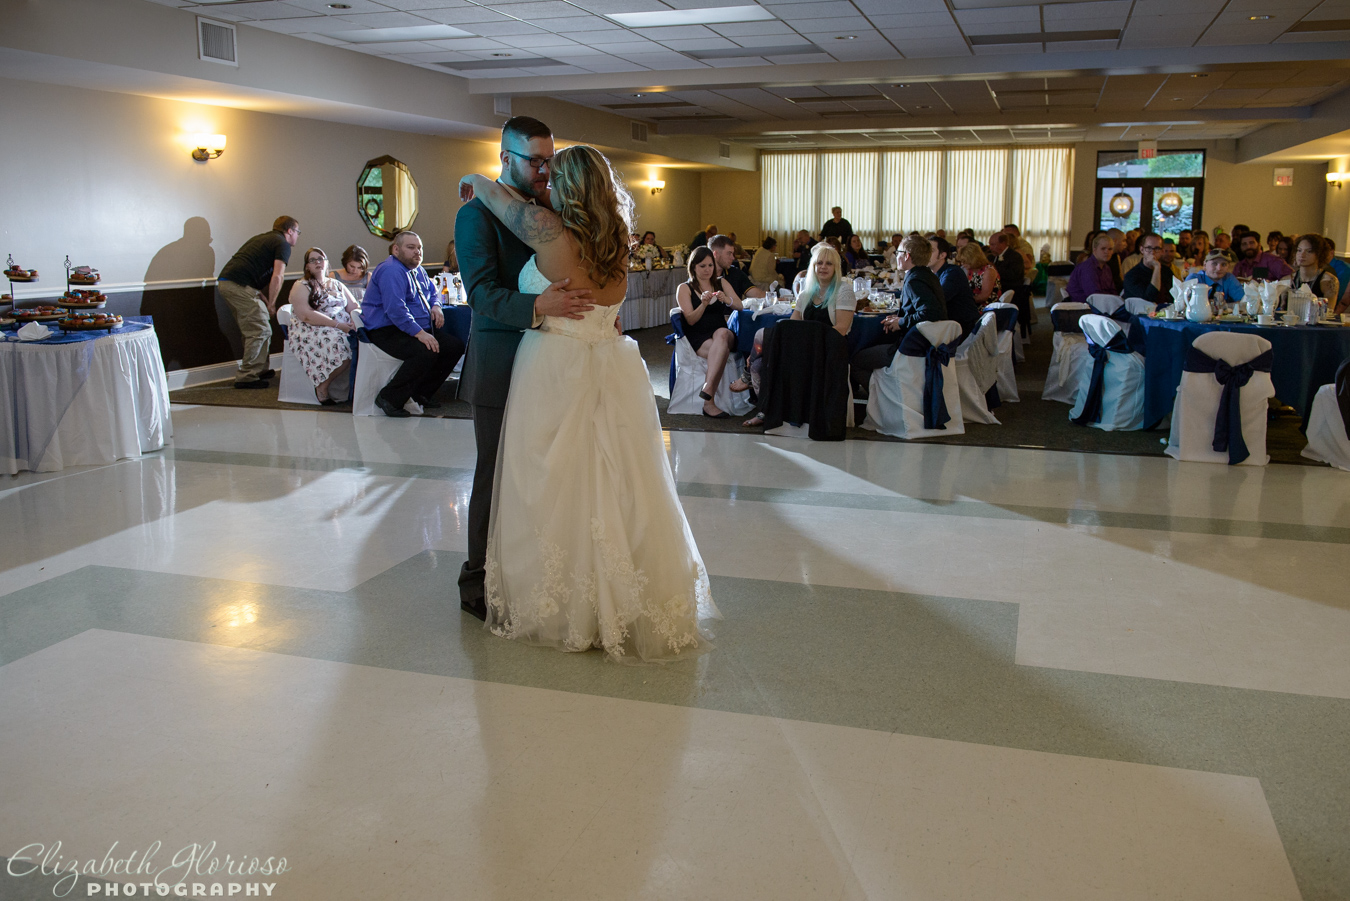 Zakovec_Wedding_Glorioso_Photography_Cleveland-142